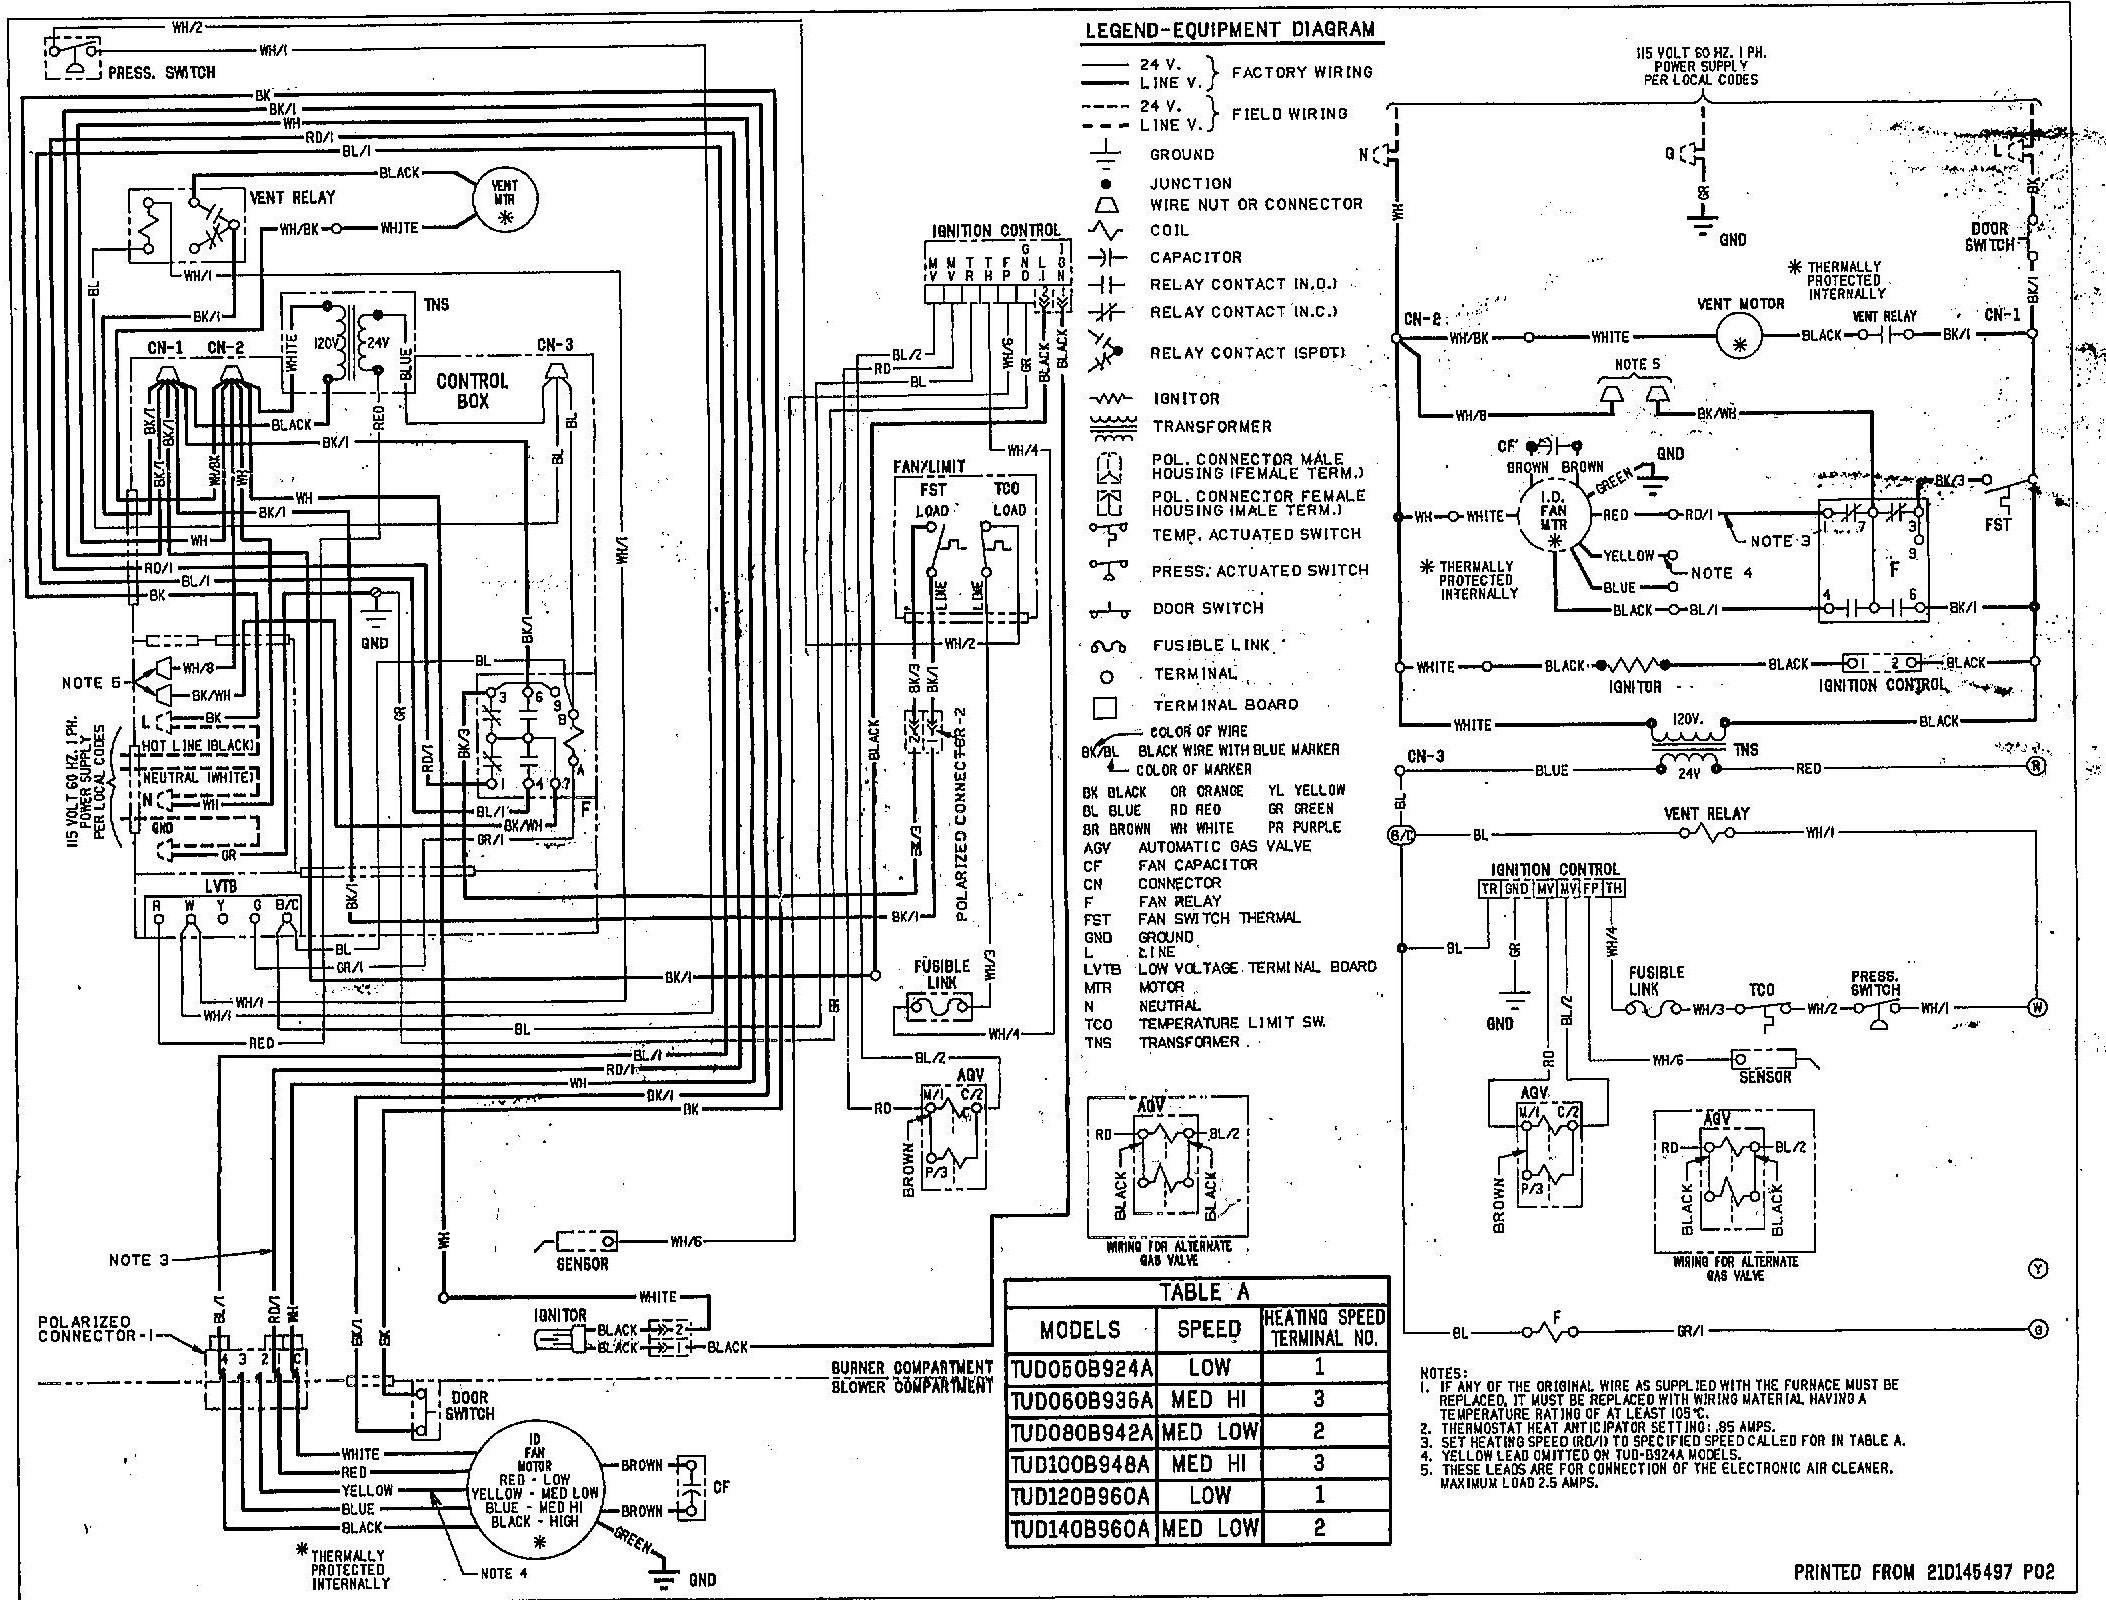 trane ac wiring diagram Download-Trane Ac Wiring Diagram New Trane Wiring Diagram Hd Dump 2-g